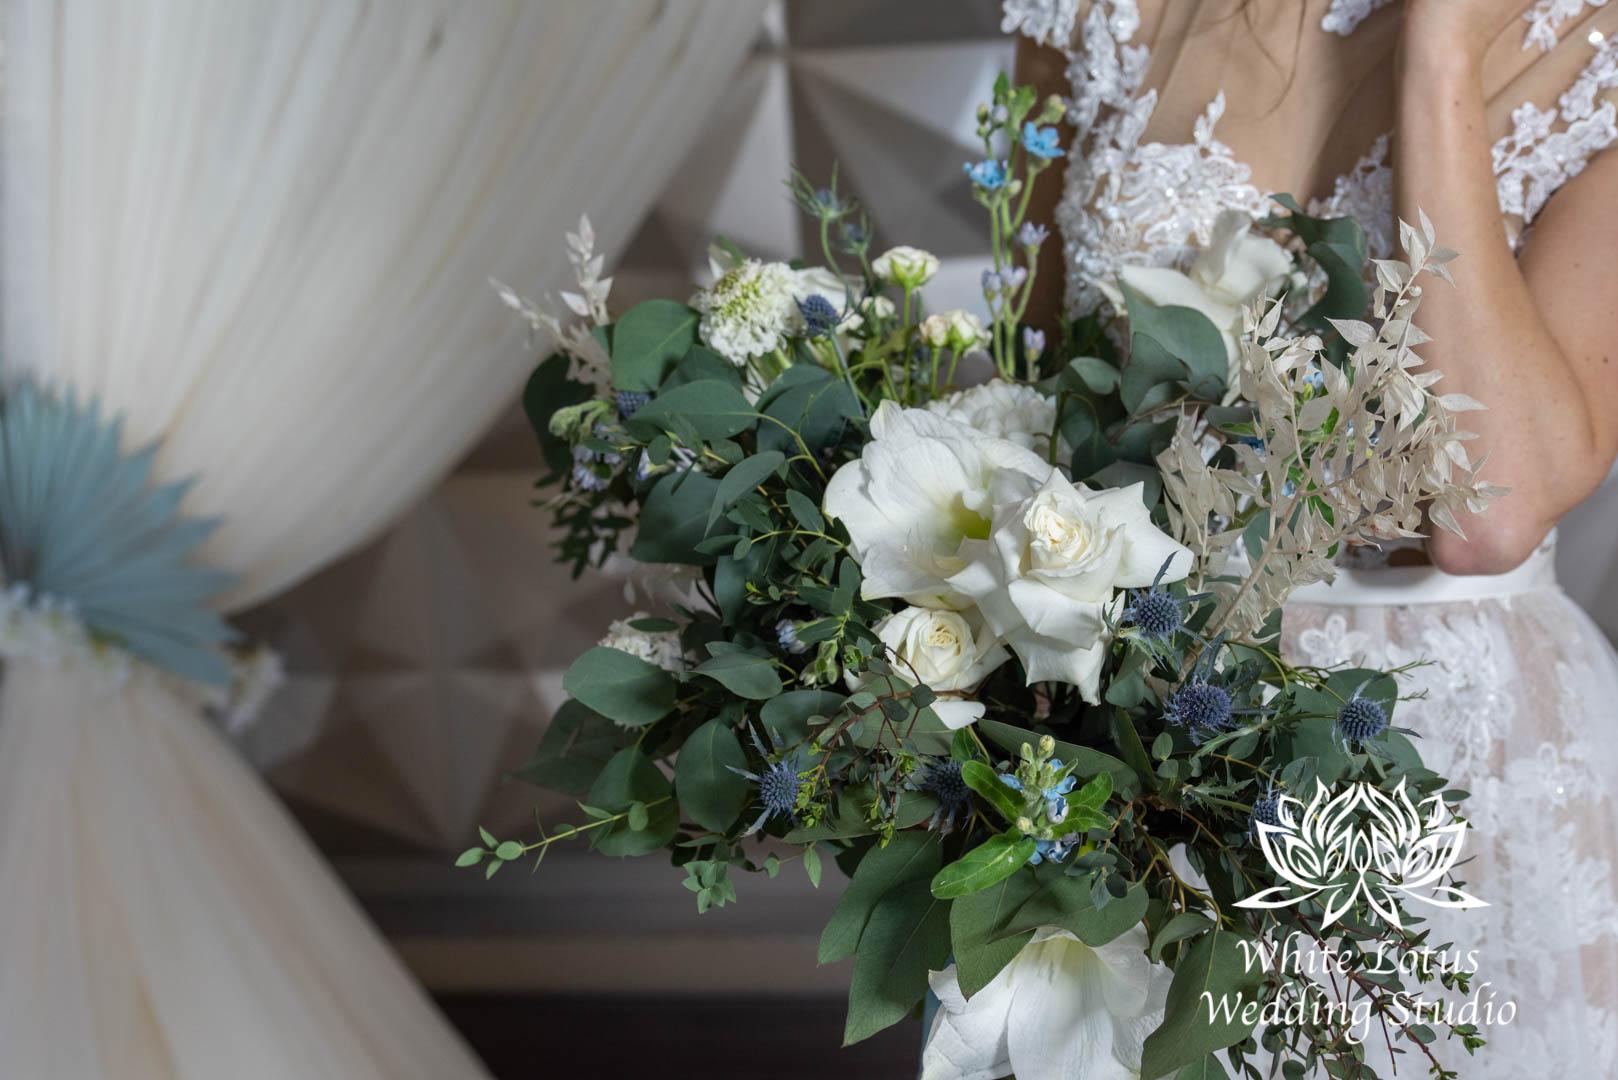 054- GLAM WINTERLUXE WEDDING INSPIRATION